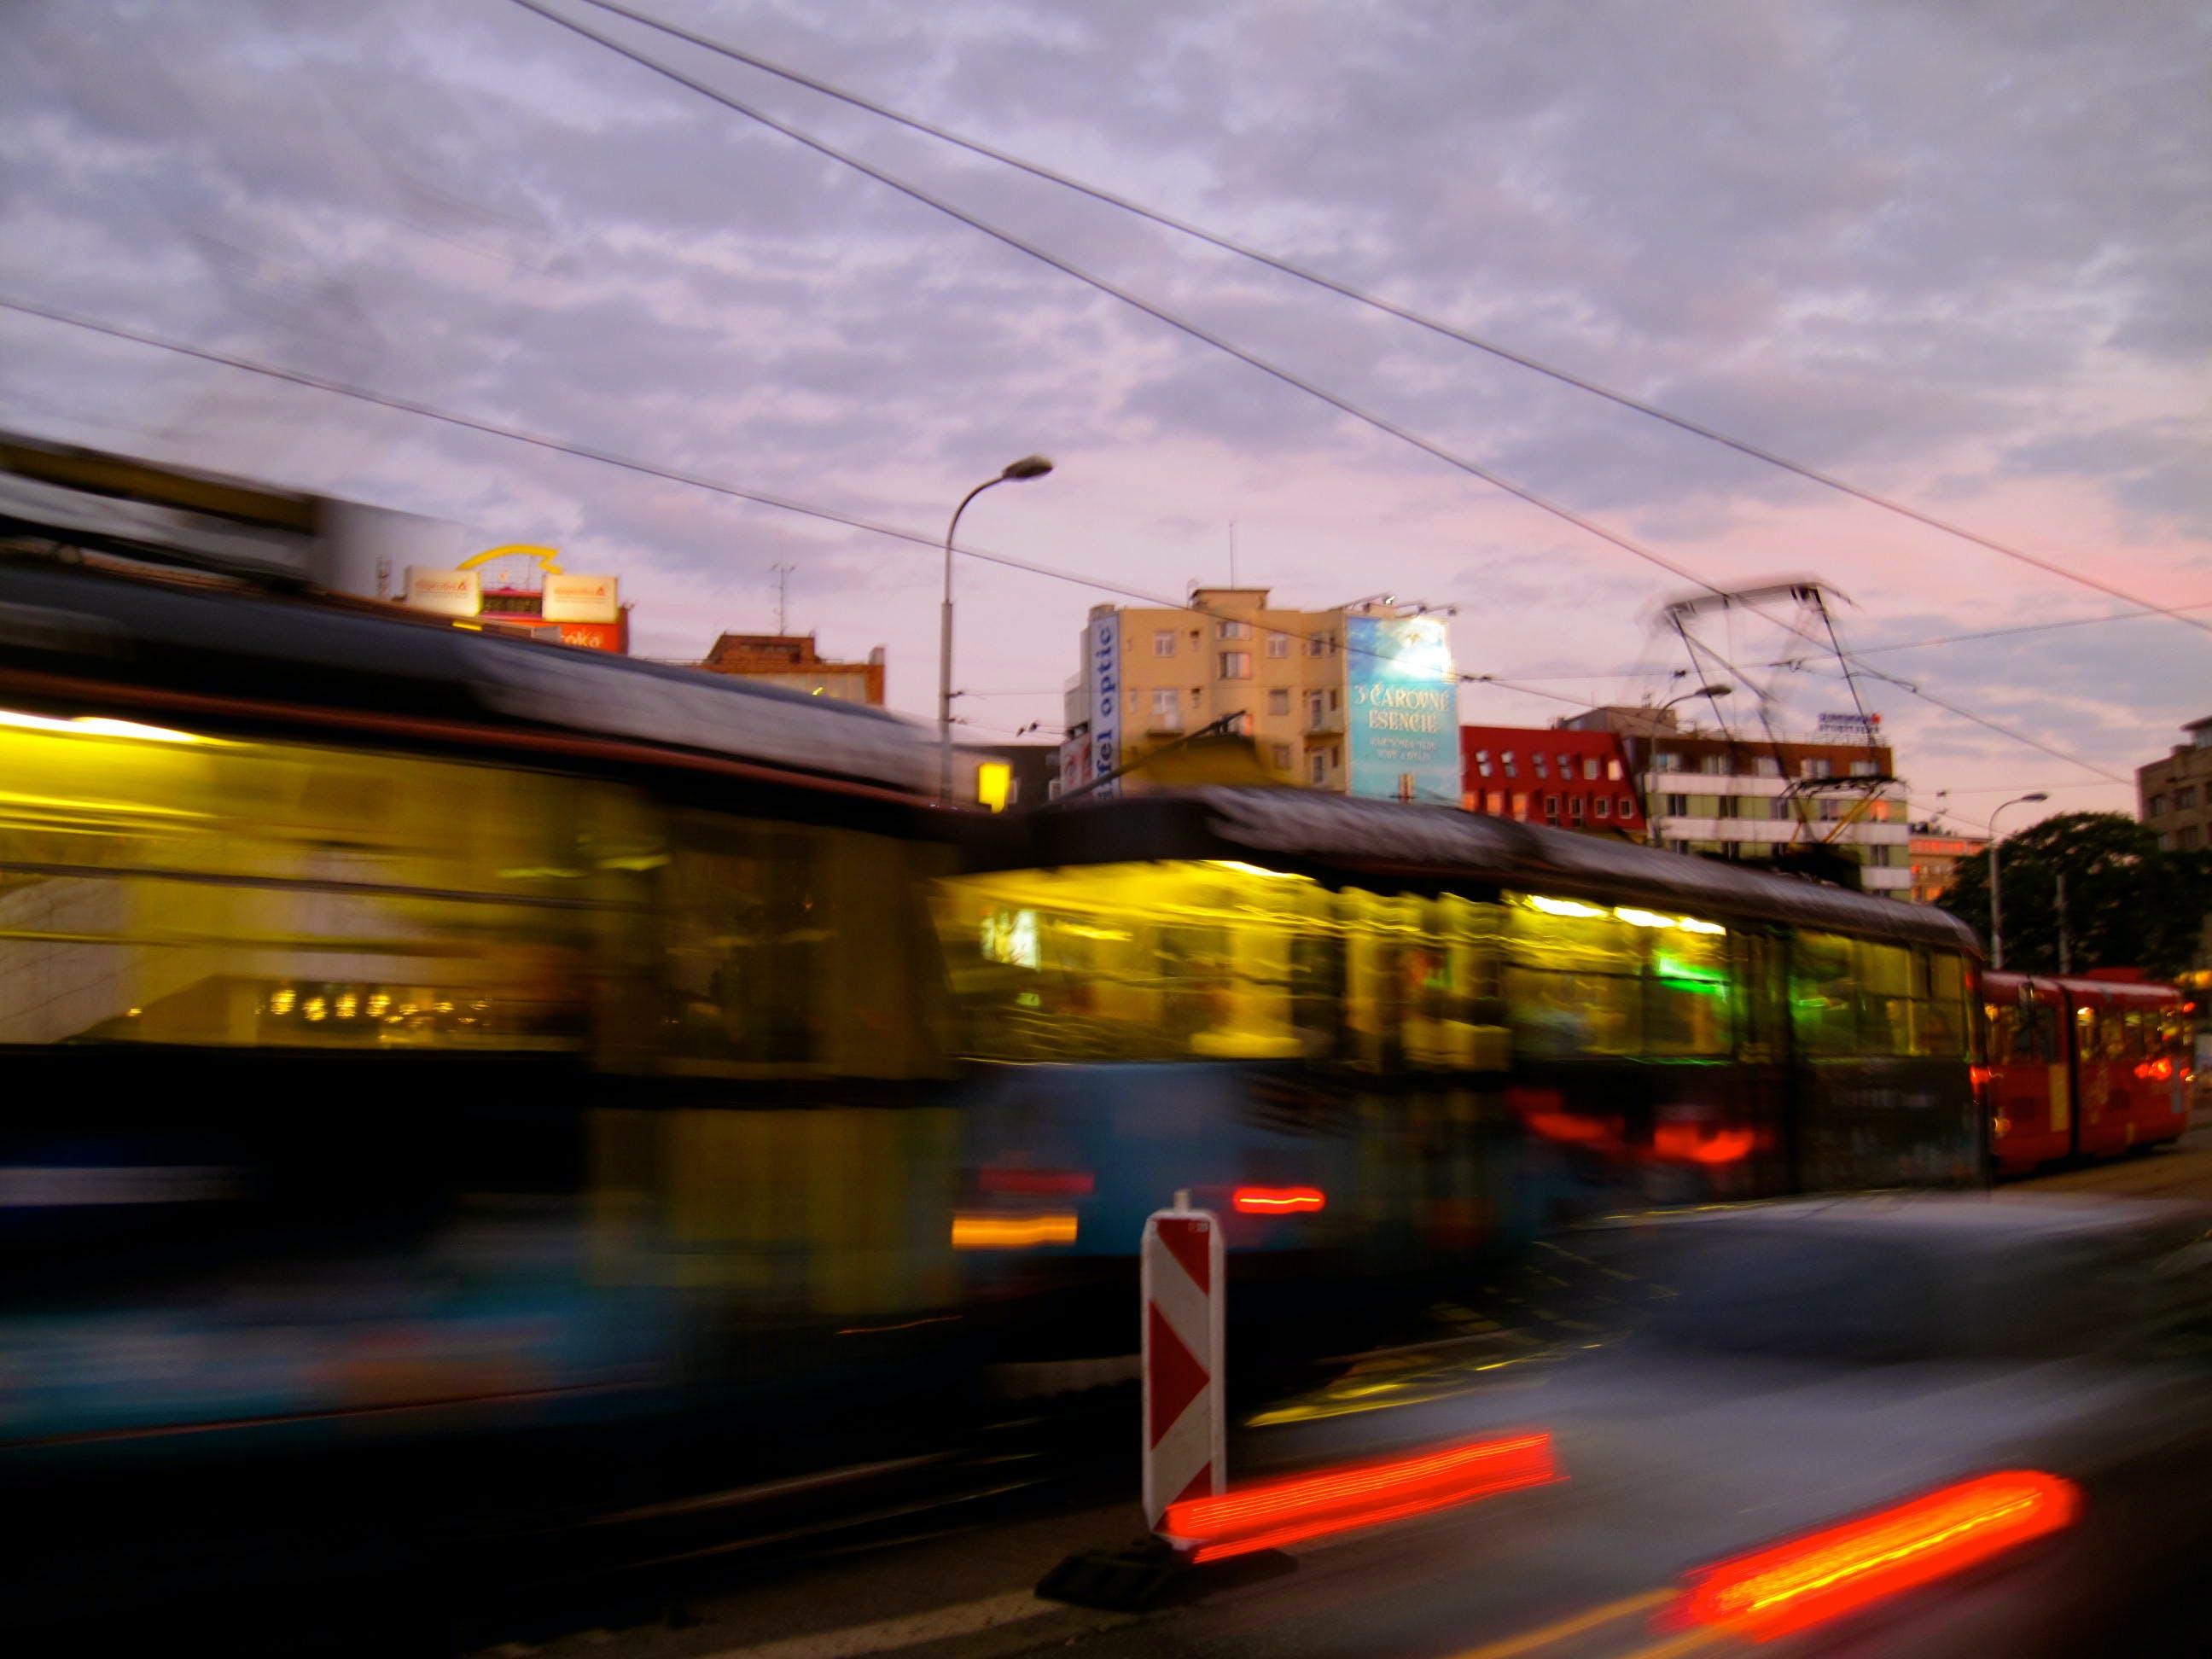 Free stock photo of bratislava, slovakia, sunset, tram